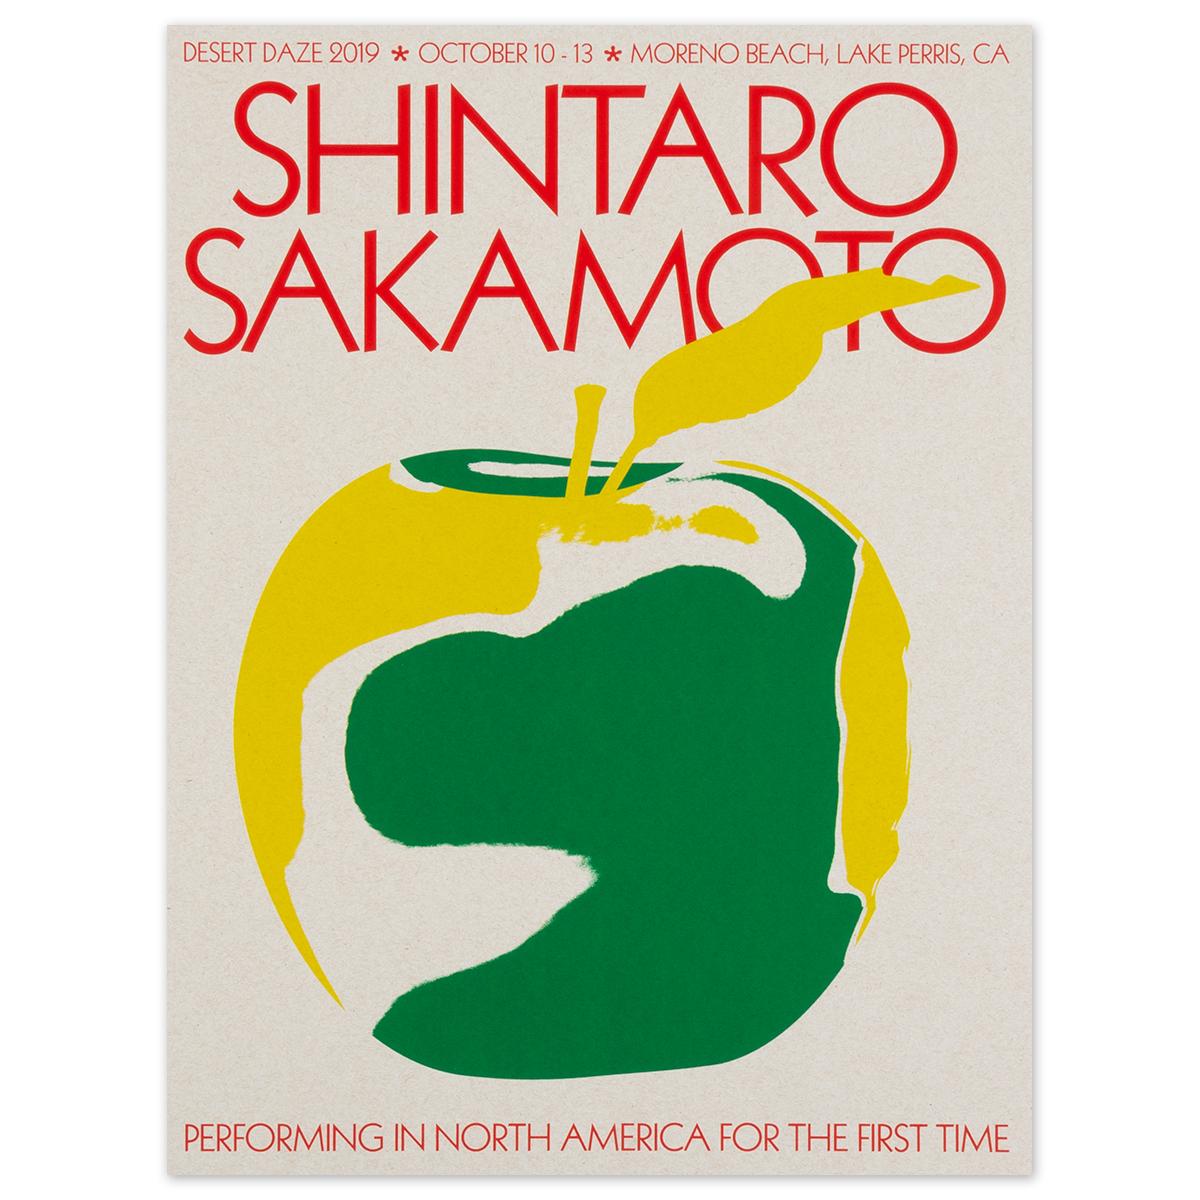 2019 Shintaro Sakomoto poster by Aaron Lowell Denton